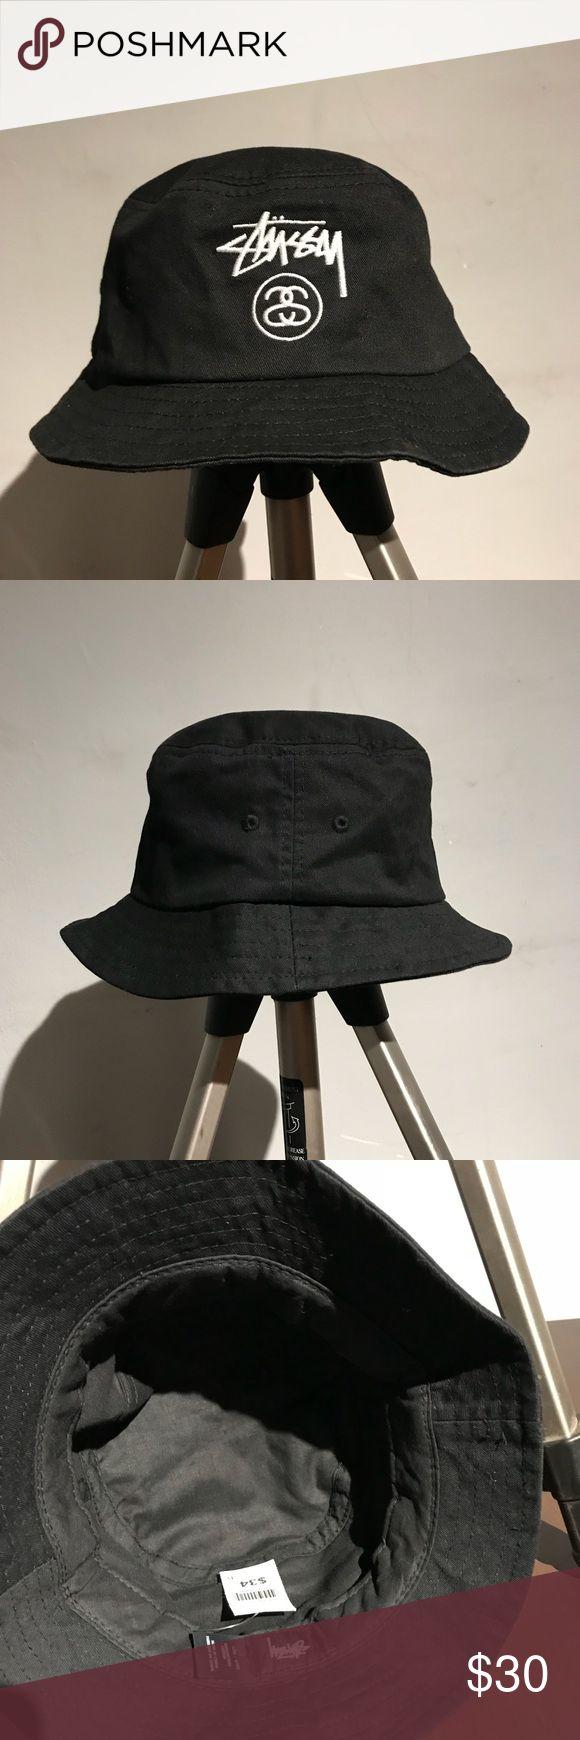 New Stussy Bucket Hat New Authentic Black Studdy Bucket Hat Stussy Accessories Hats